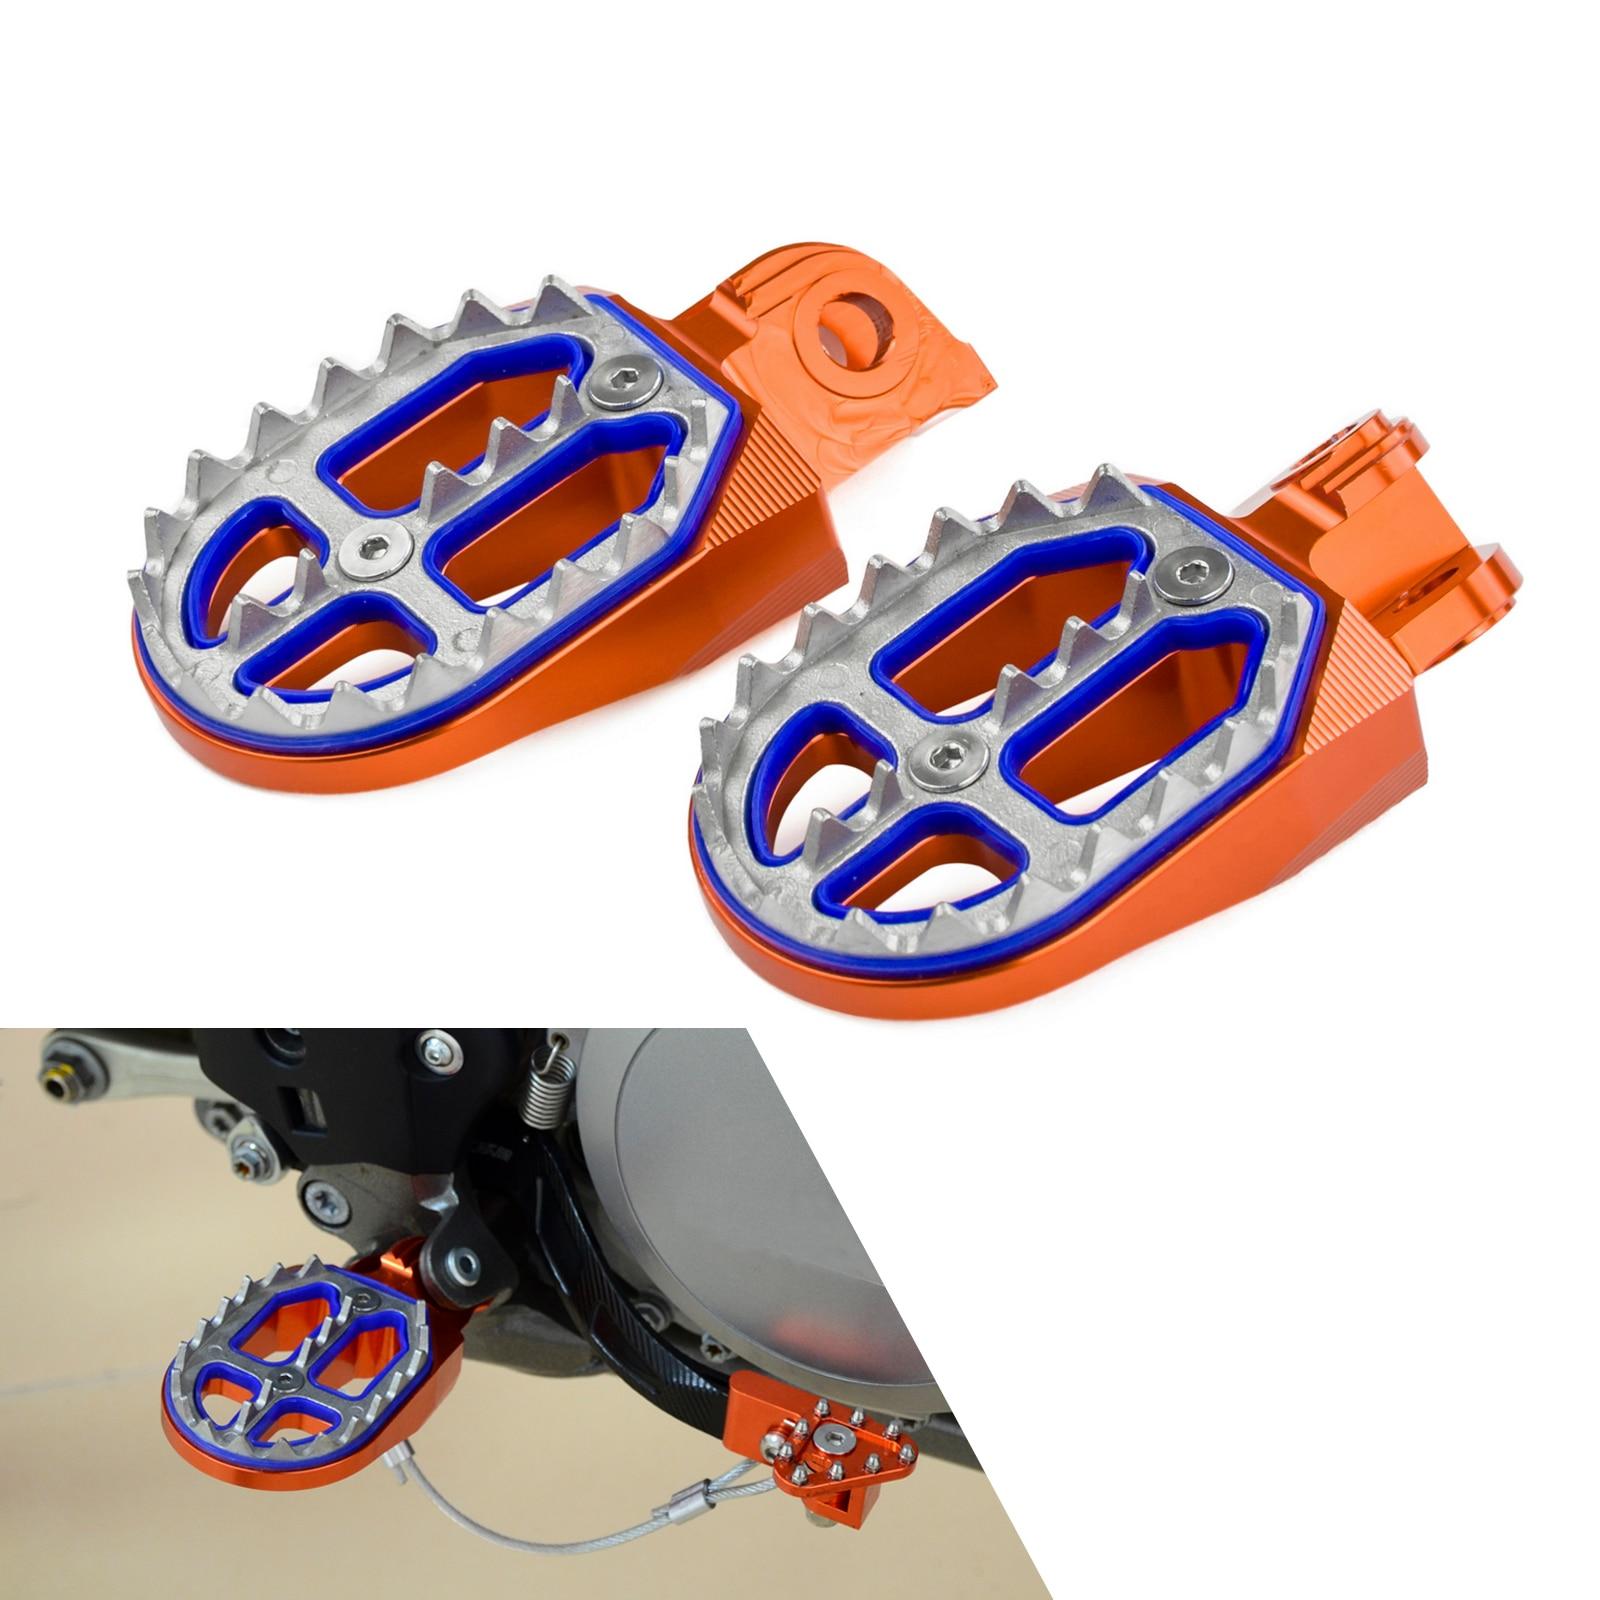 Footpeg Foot Rest Pegs Pedal For KTM 50 65 85 125 150 250 300 350 400 450 500 530 SX SX-F EXC EXC-F XC XC-F XC-W XCF-W Freeride